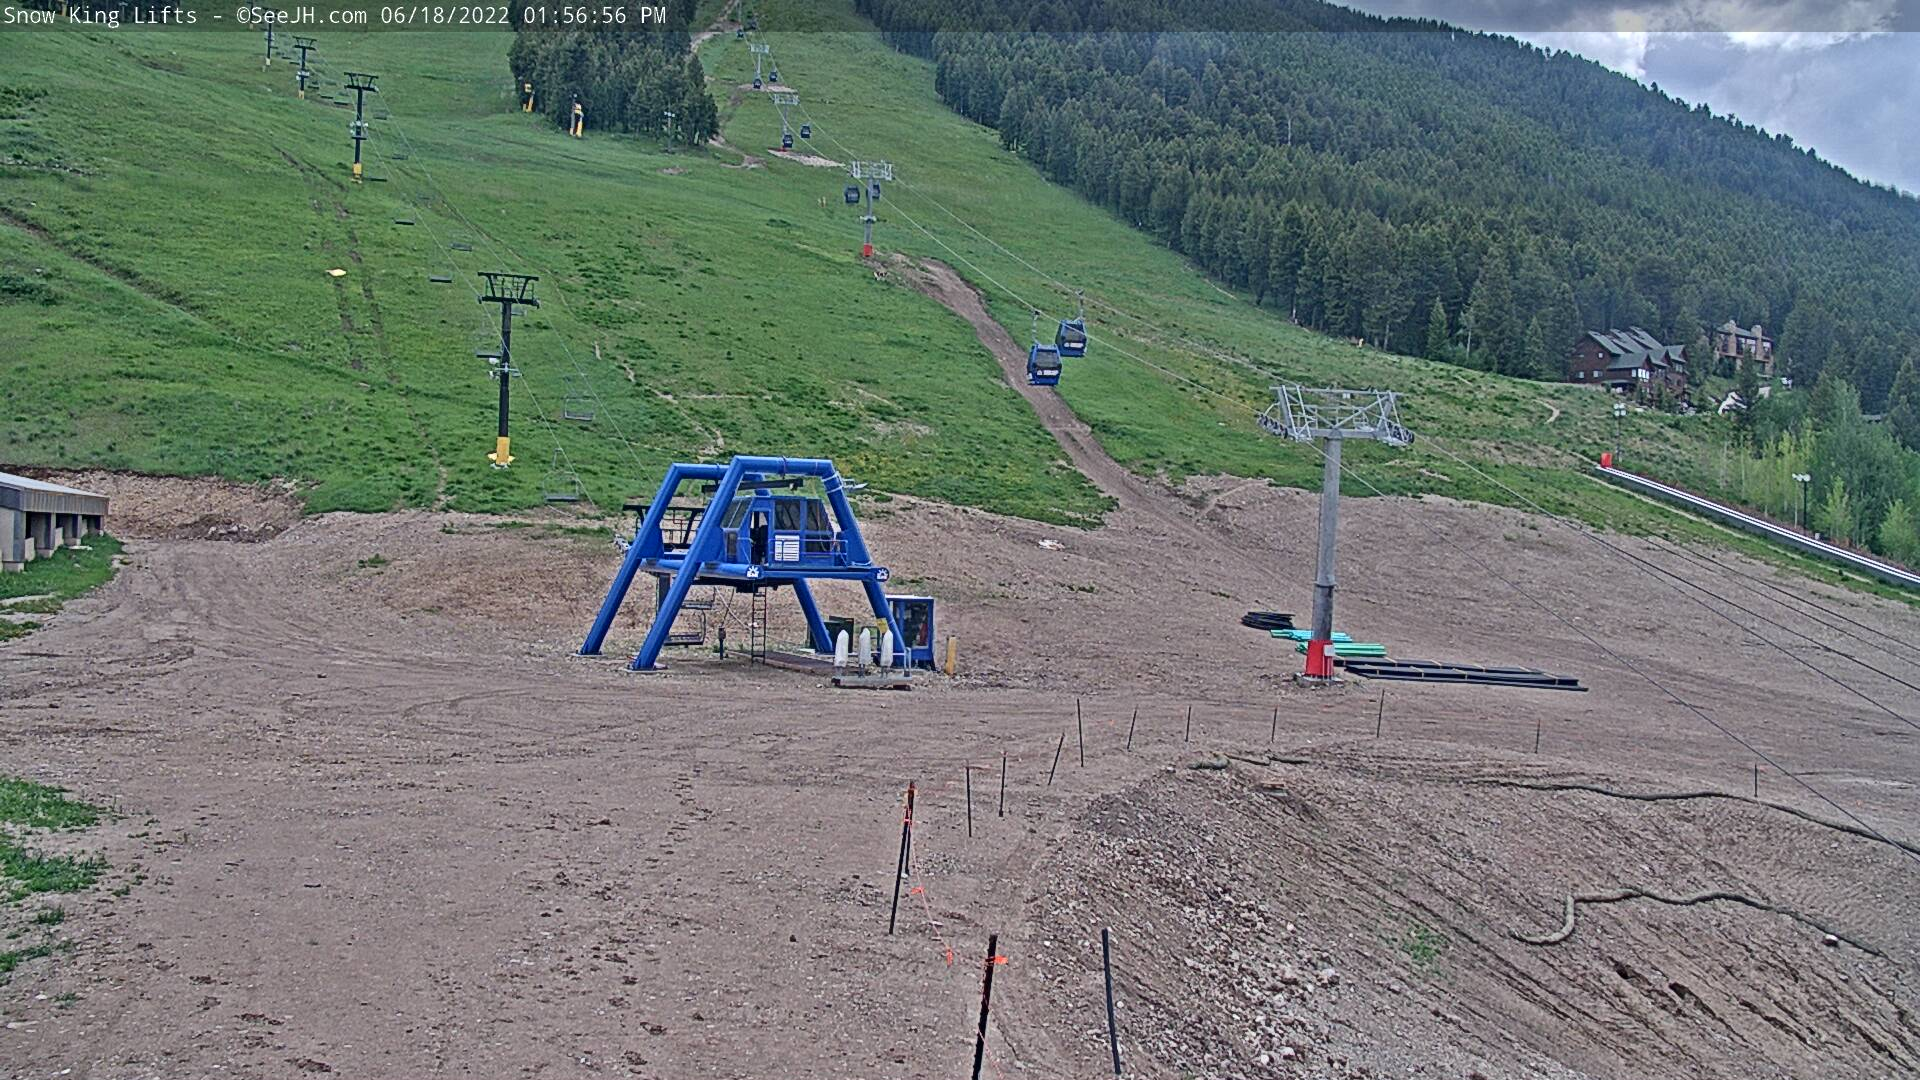 Snow King - Base Lifts